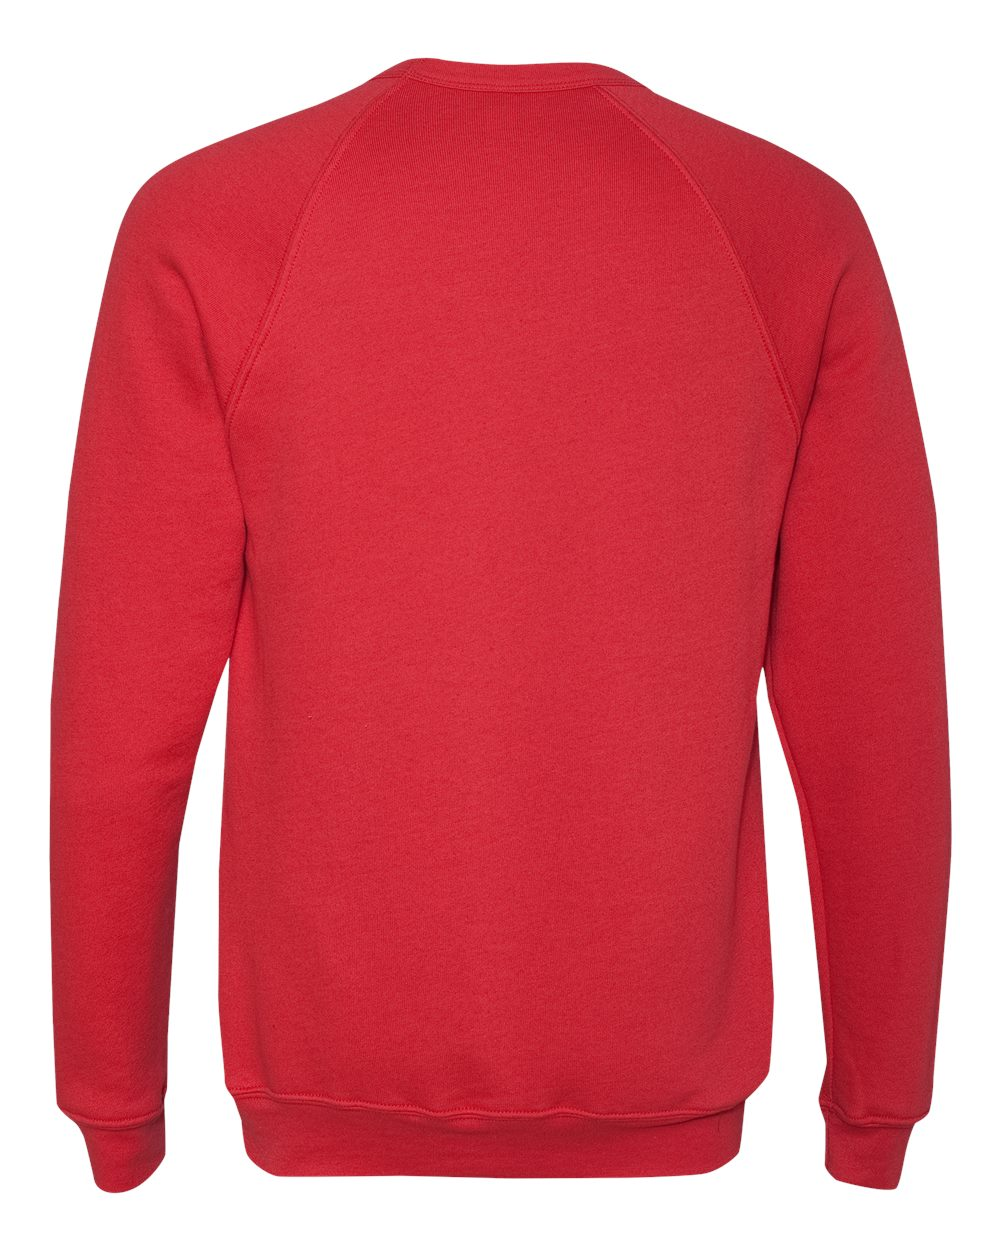 Bella-Canvas-Unisex-Sponge-Fleece-Crewneck-Sweatshirt-Top-Blank-3901-up-to-2XL thumbnail 61